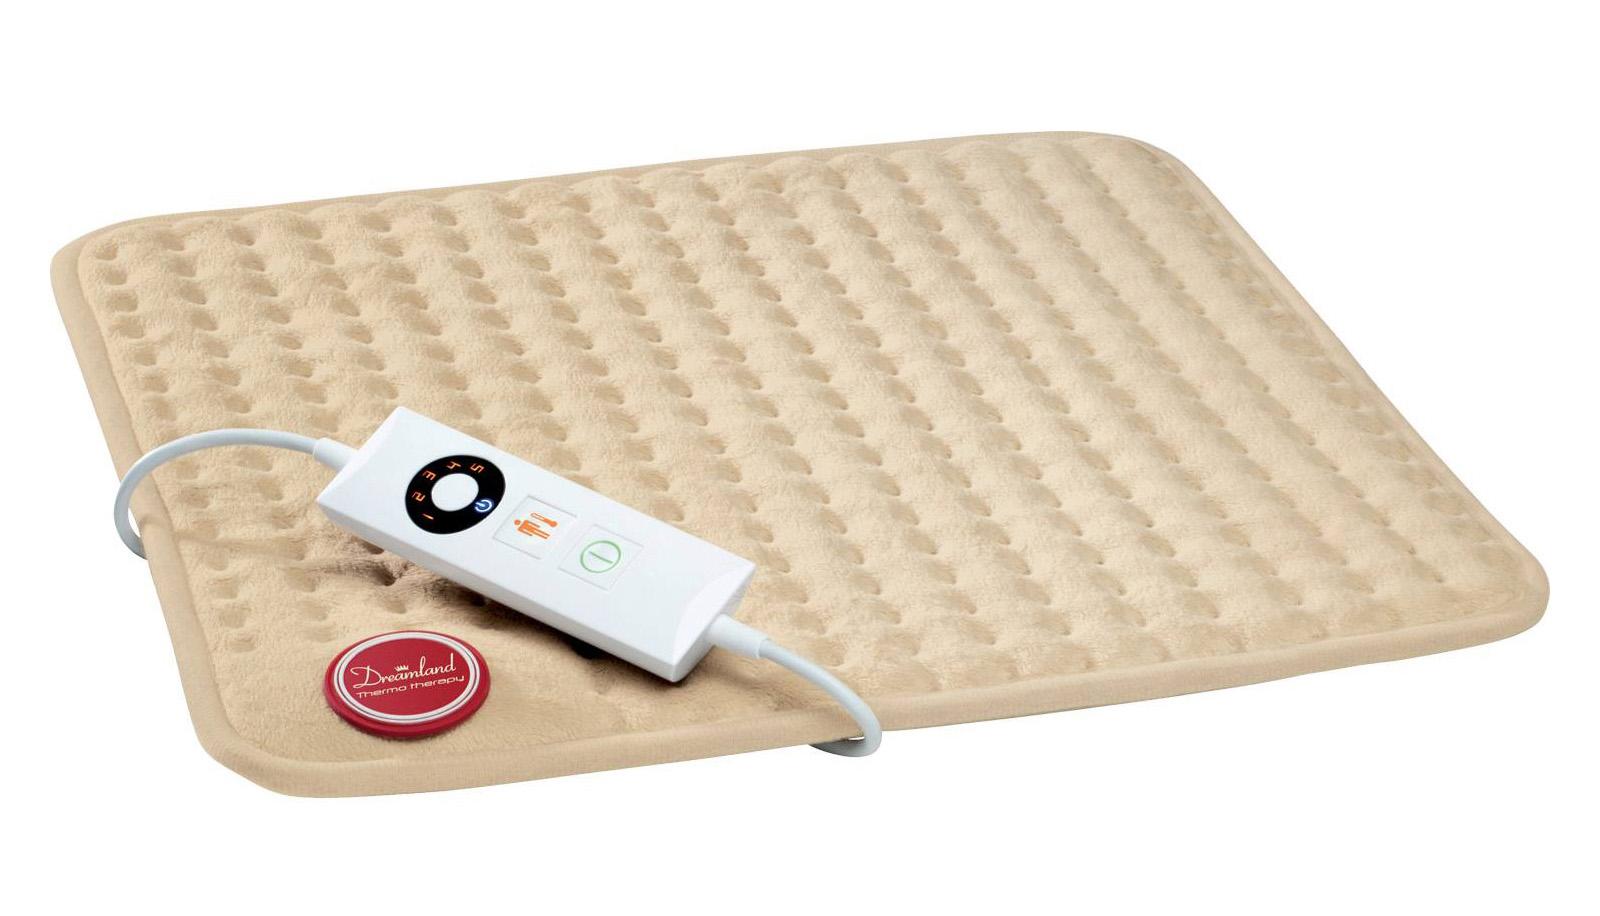 dreamland electric blanket washing instructions